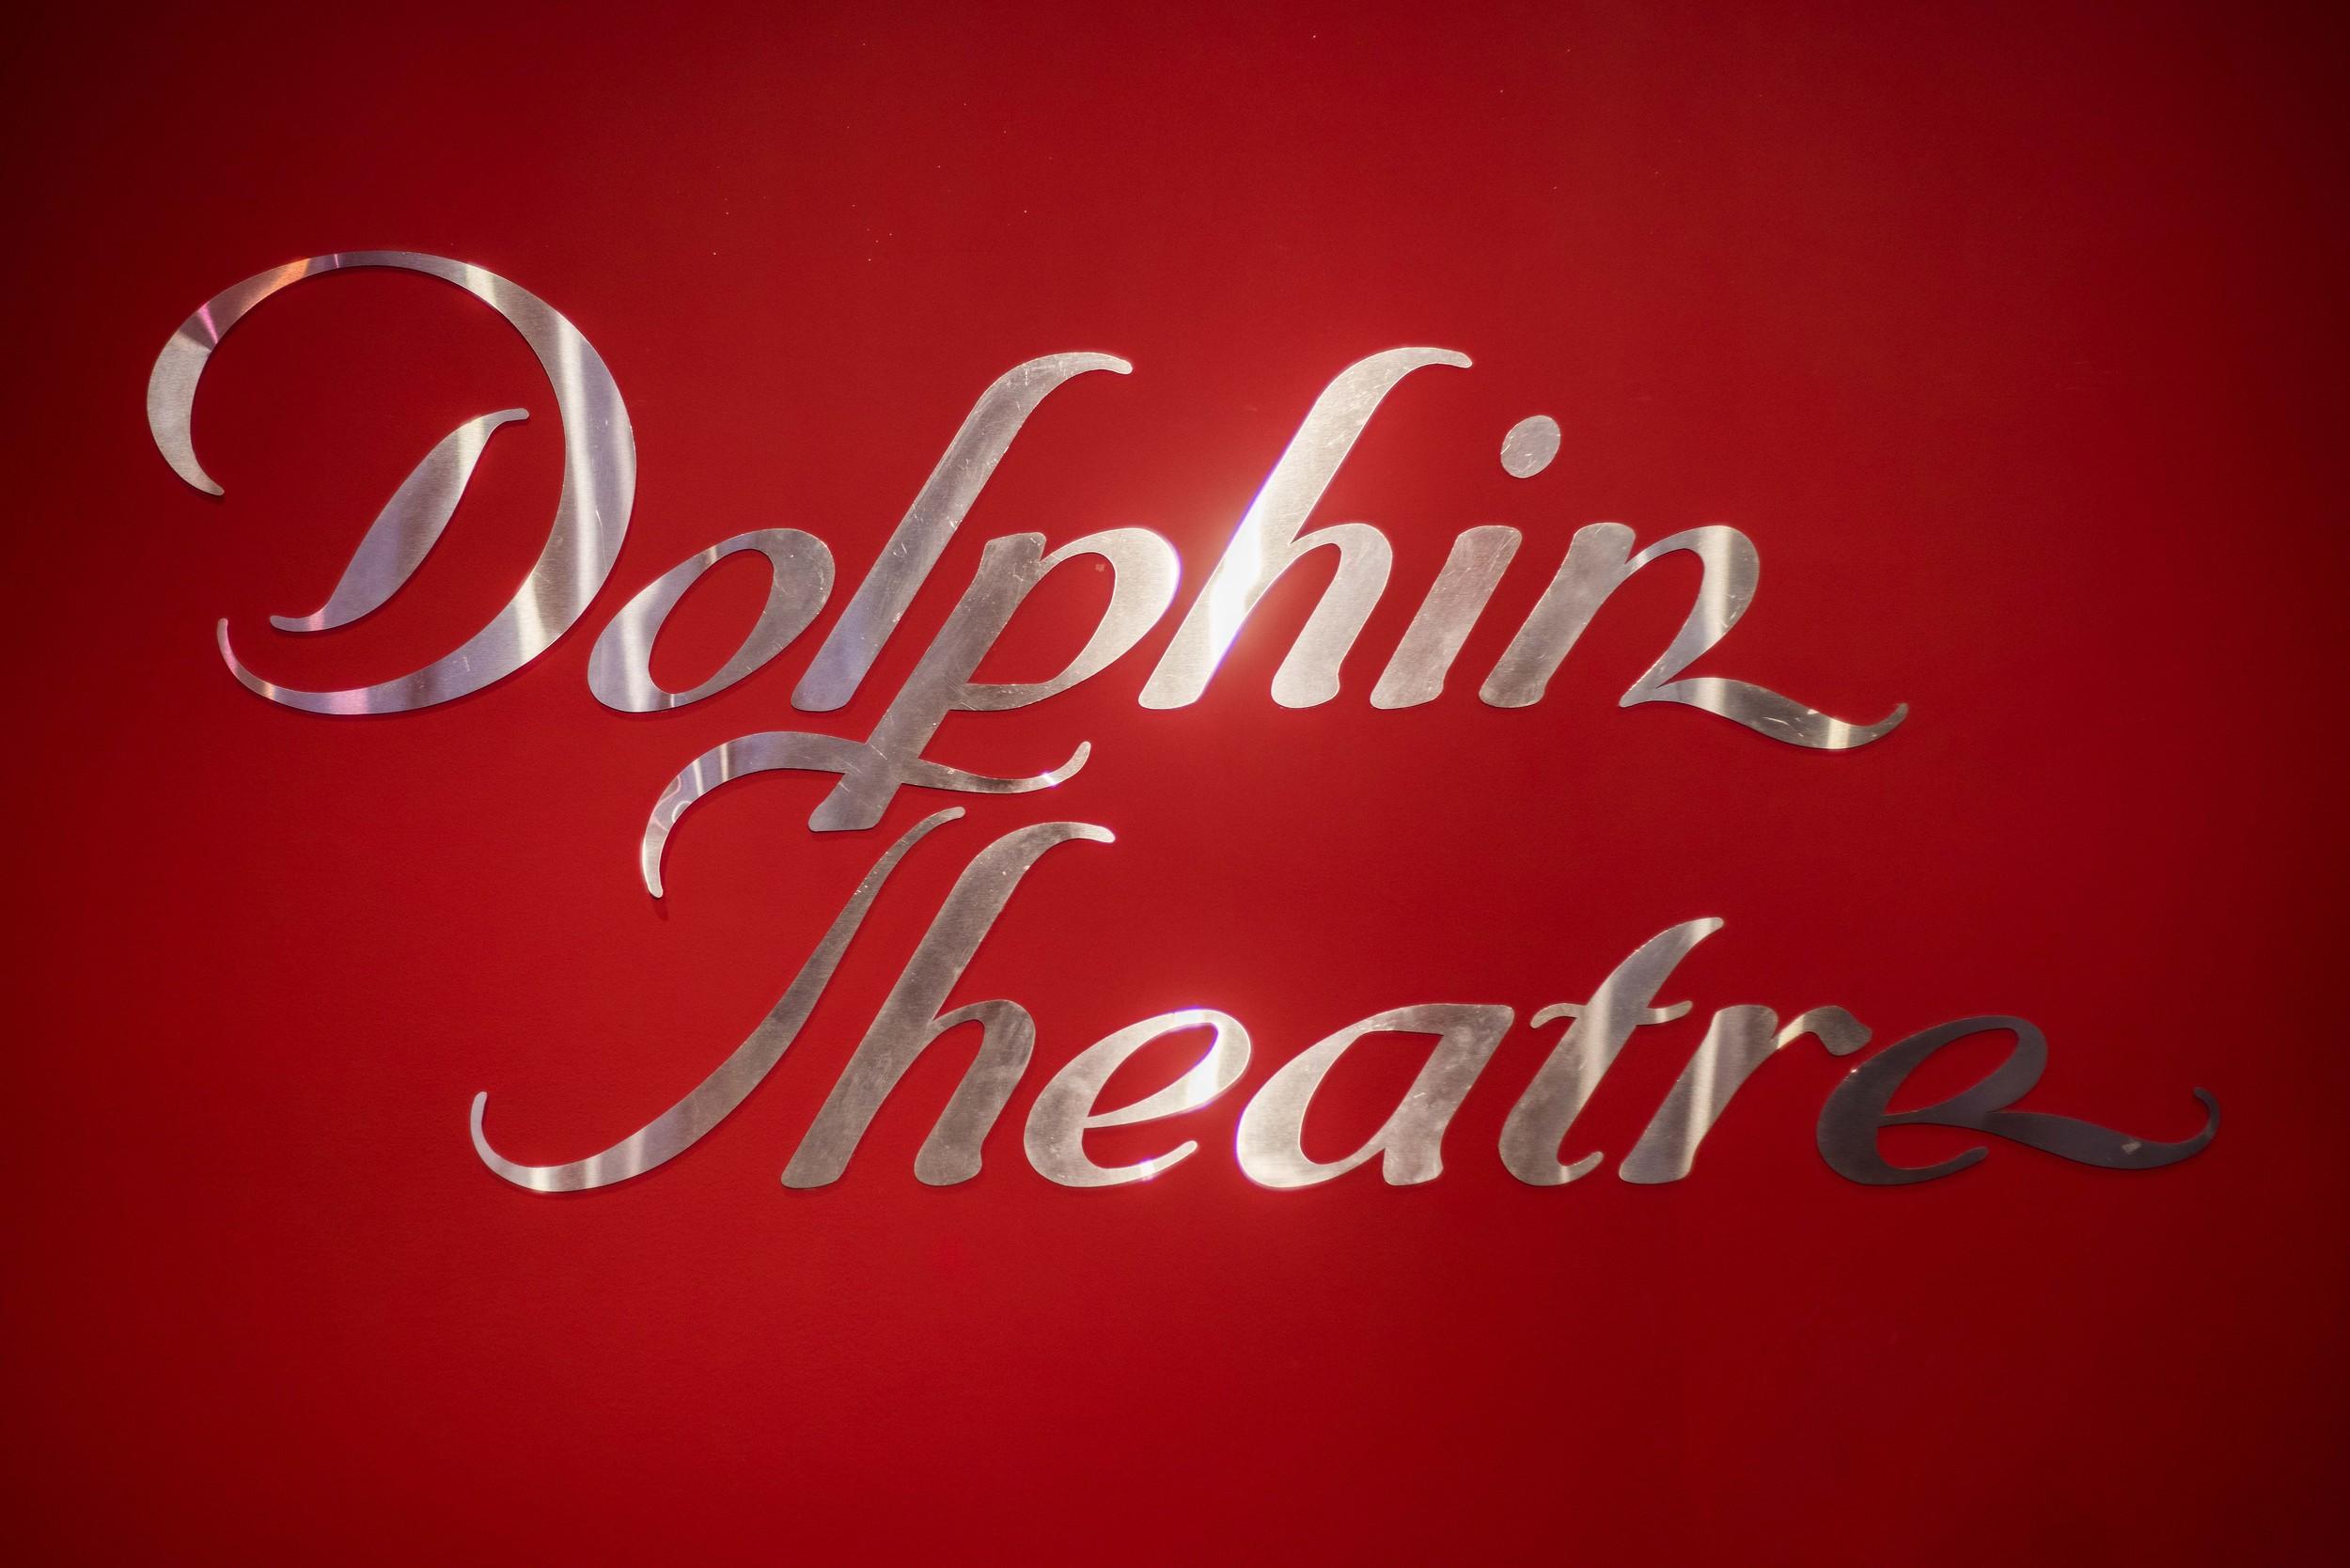 Dolphin Theatre Image0001.jpg